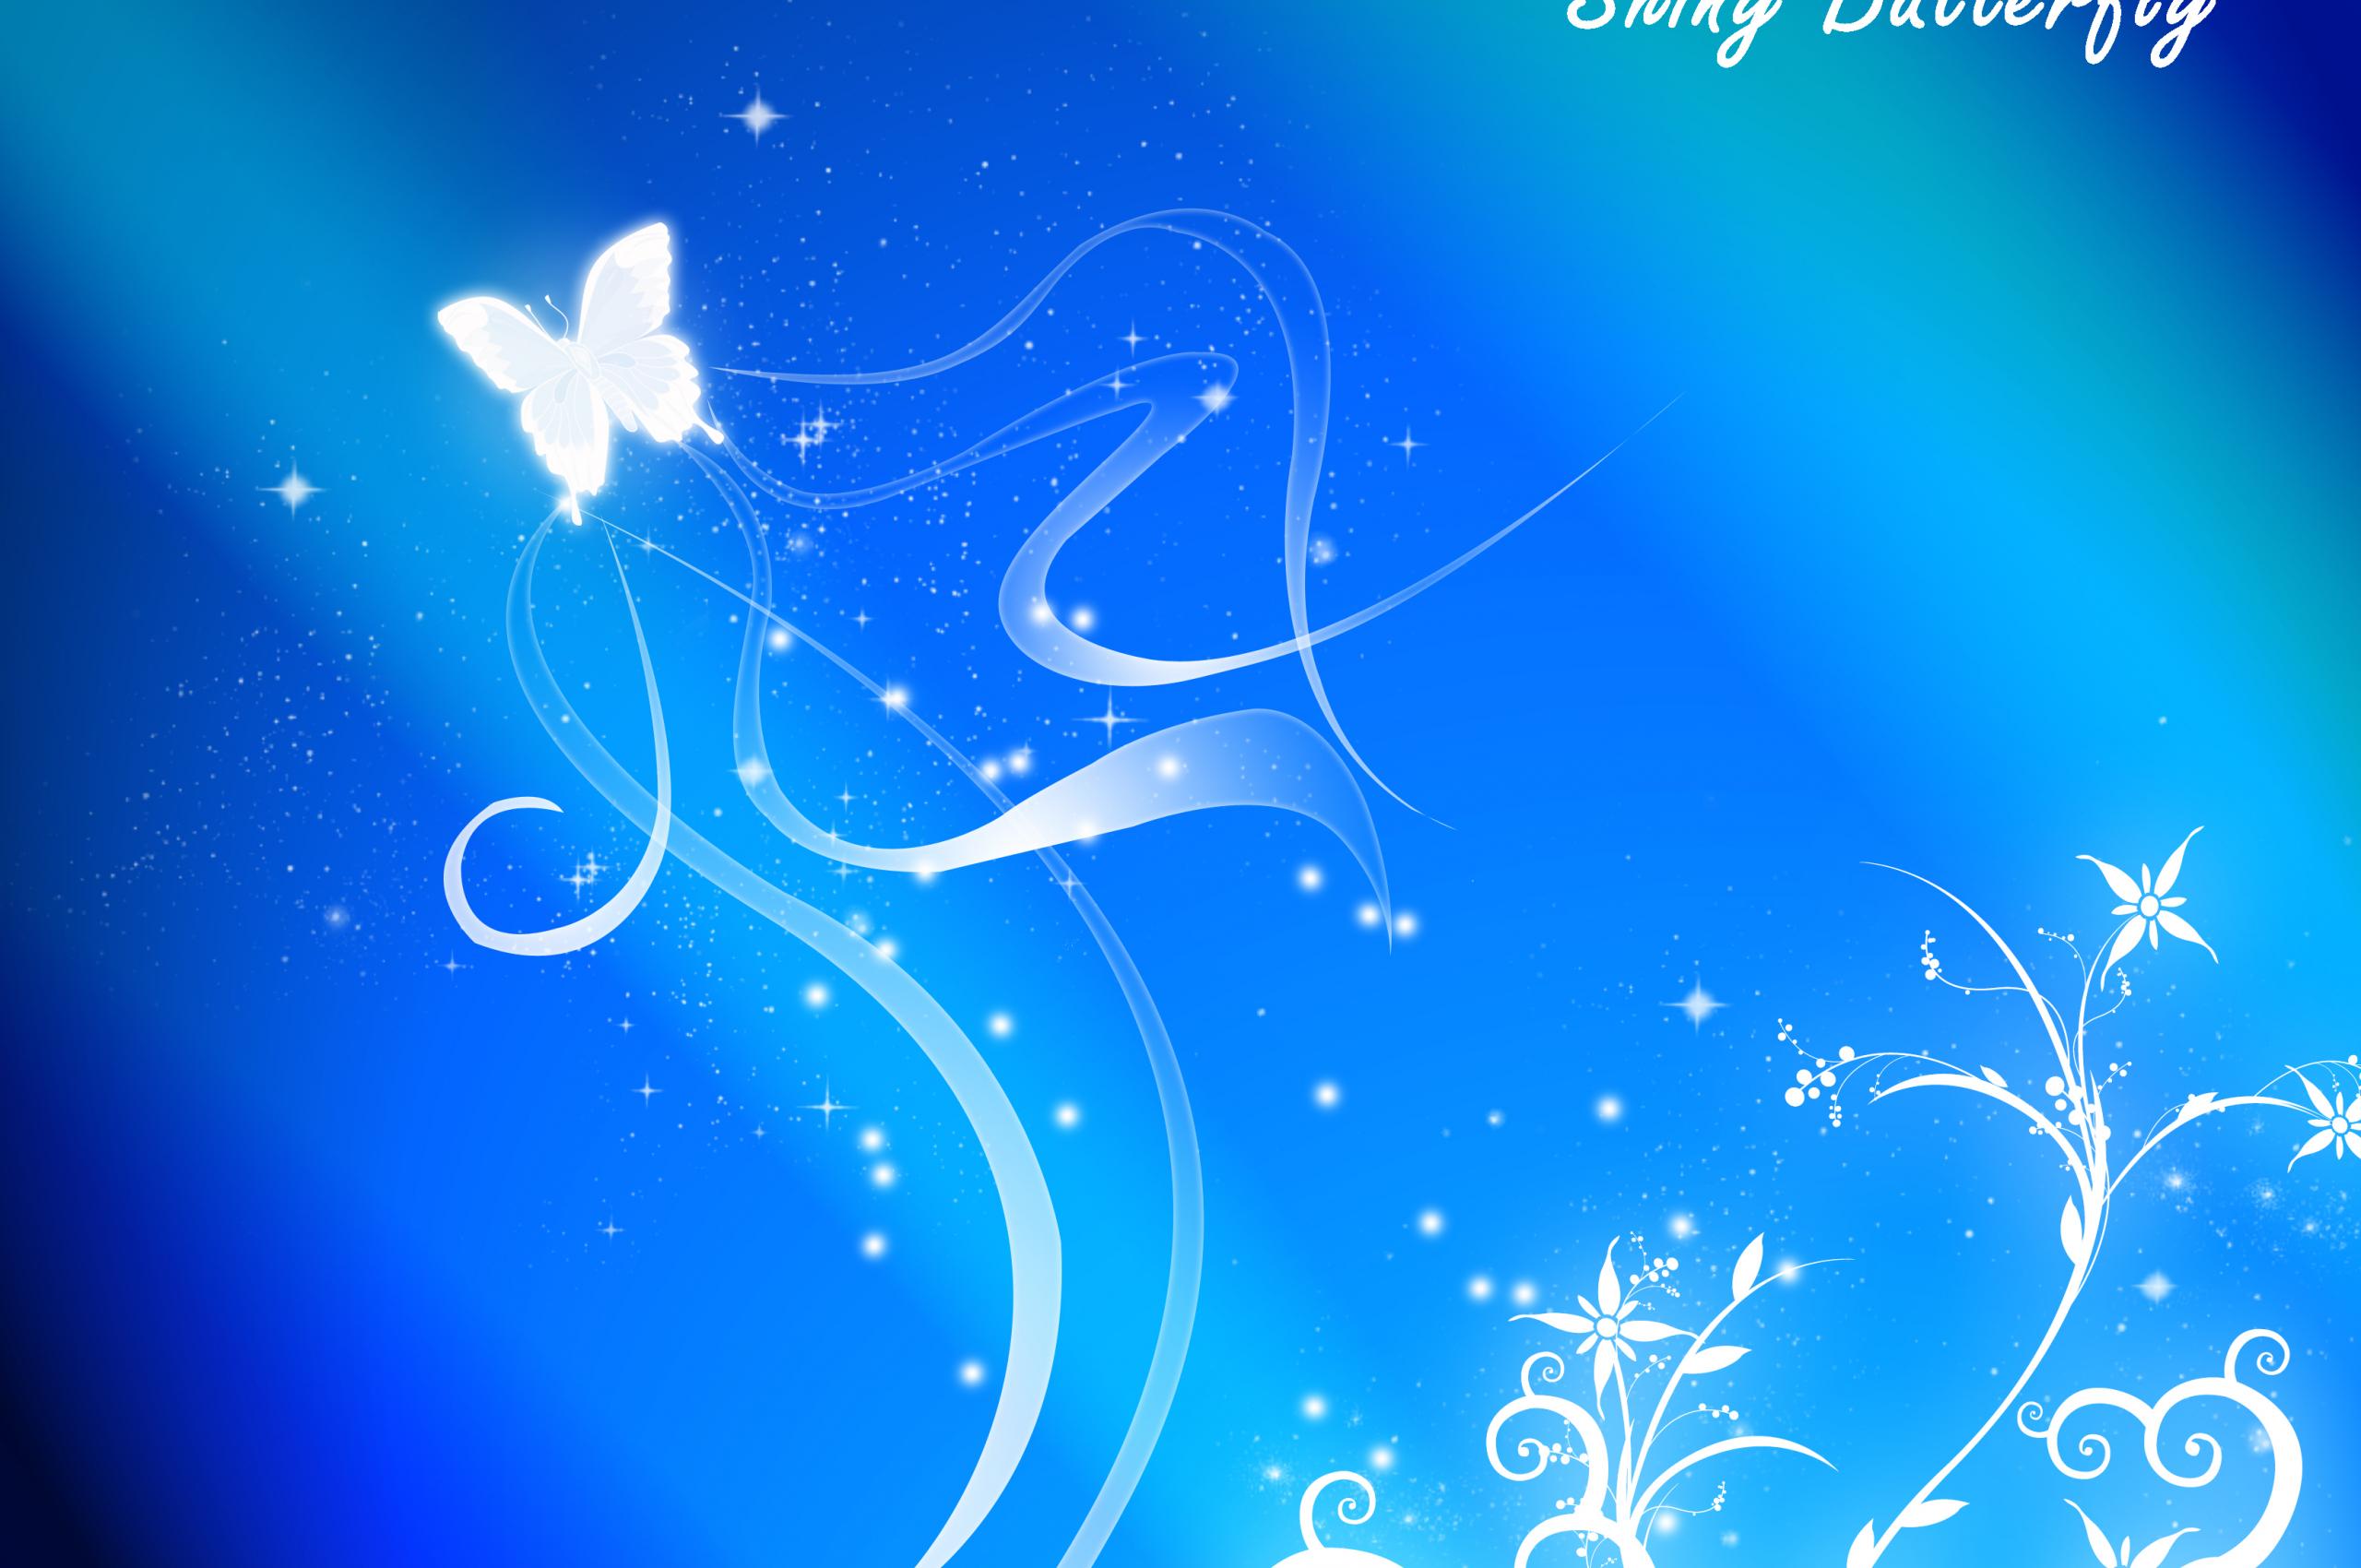 Free Download Blue Wallpapers Designs Desktop Cool Wallpapers 3300x2550 For Your Desktop Mobile Tablet Explore 50 Cool Wallpaper Designs For Girls Cool Wallpaper For A Room Cool Wallpapers For